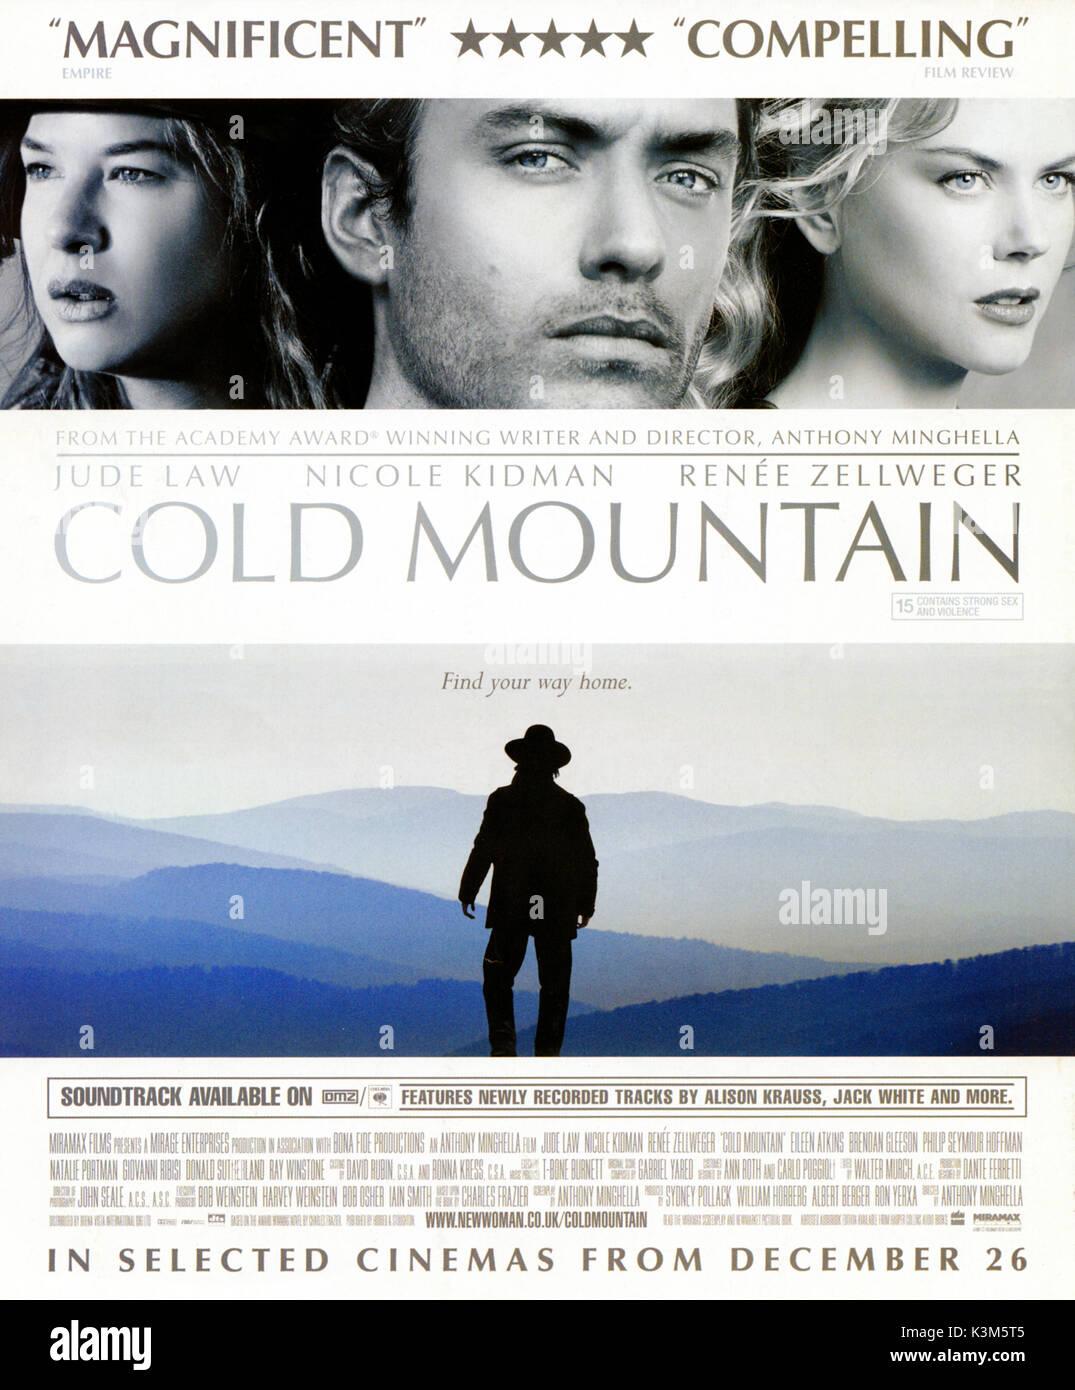 Cold Mountain Renee Zellweger Jude Law Nicole Kidman Cold Mountain Stock Photo Alamy